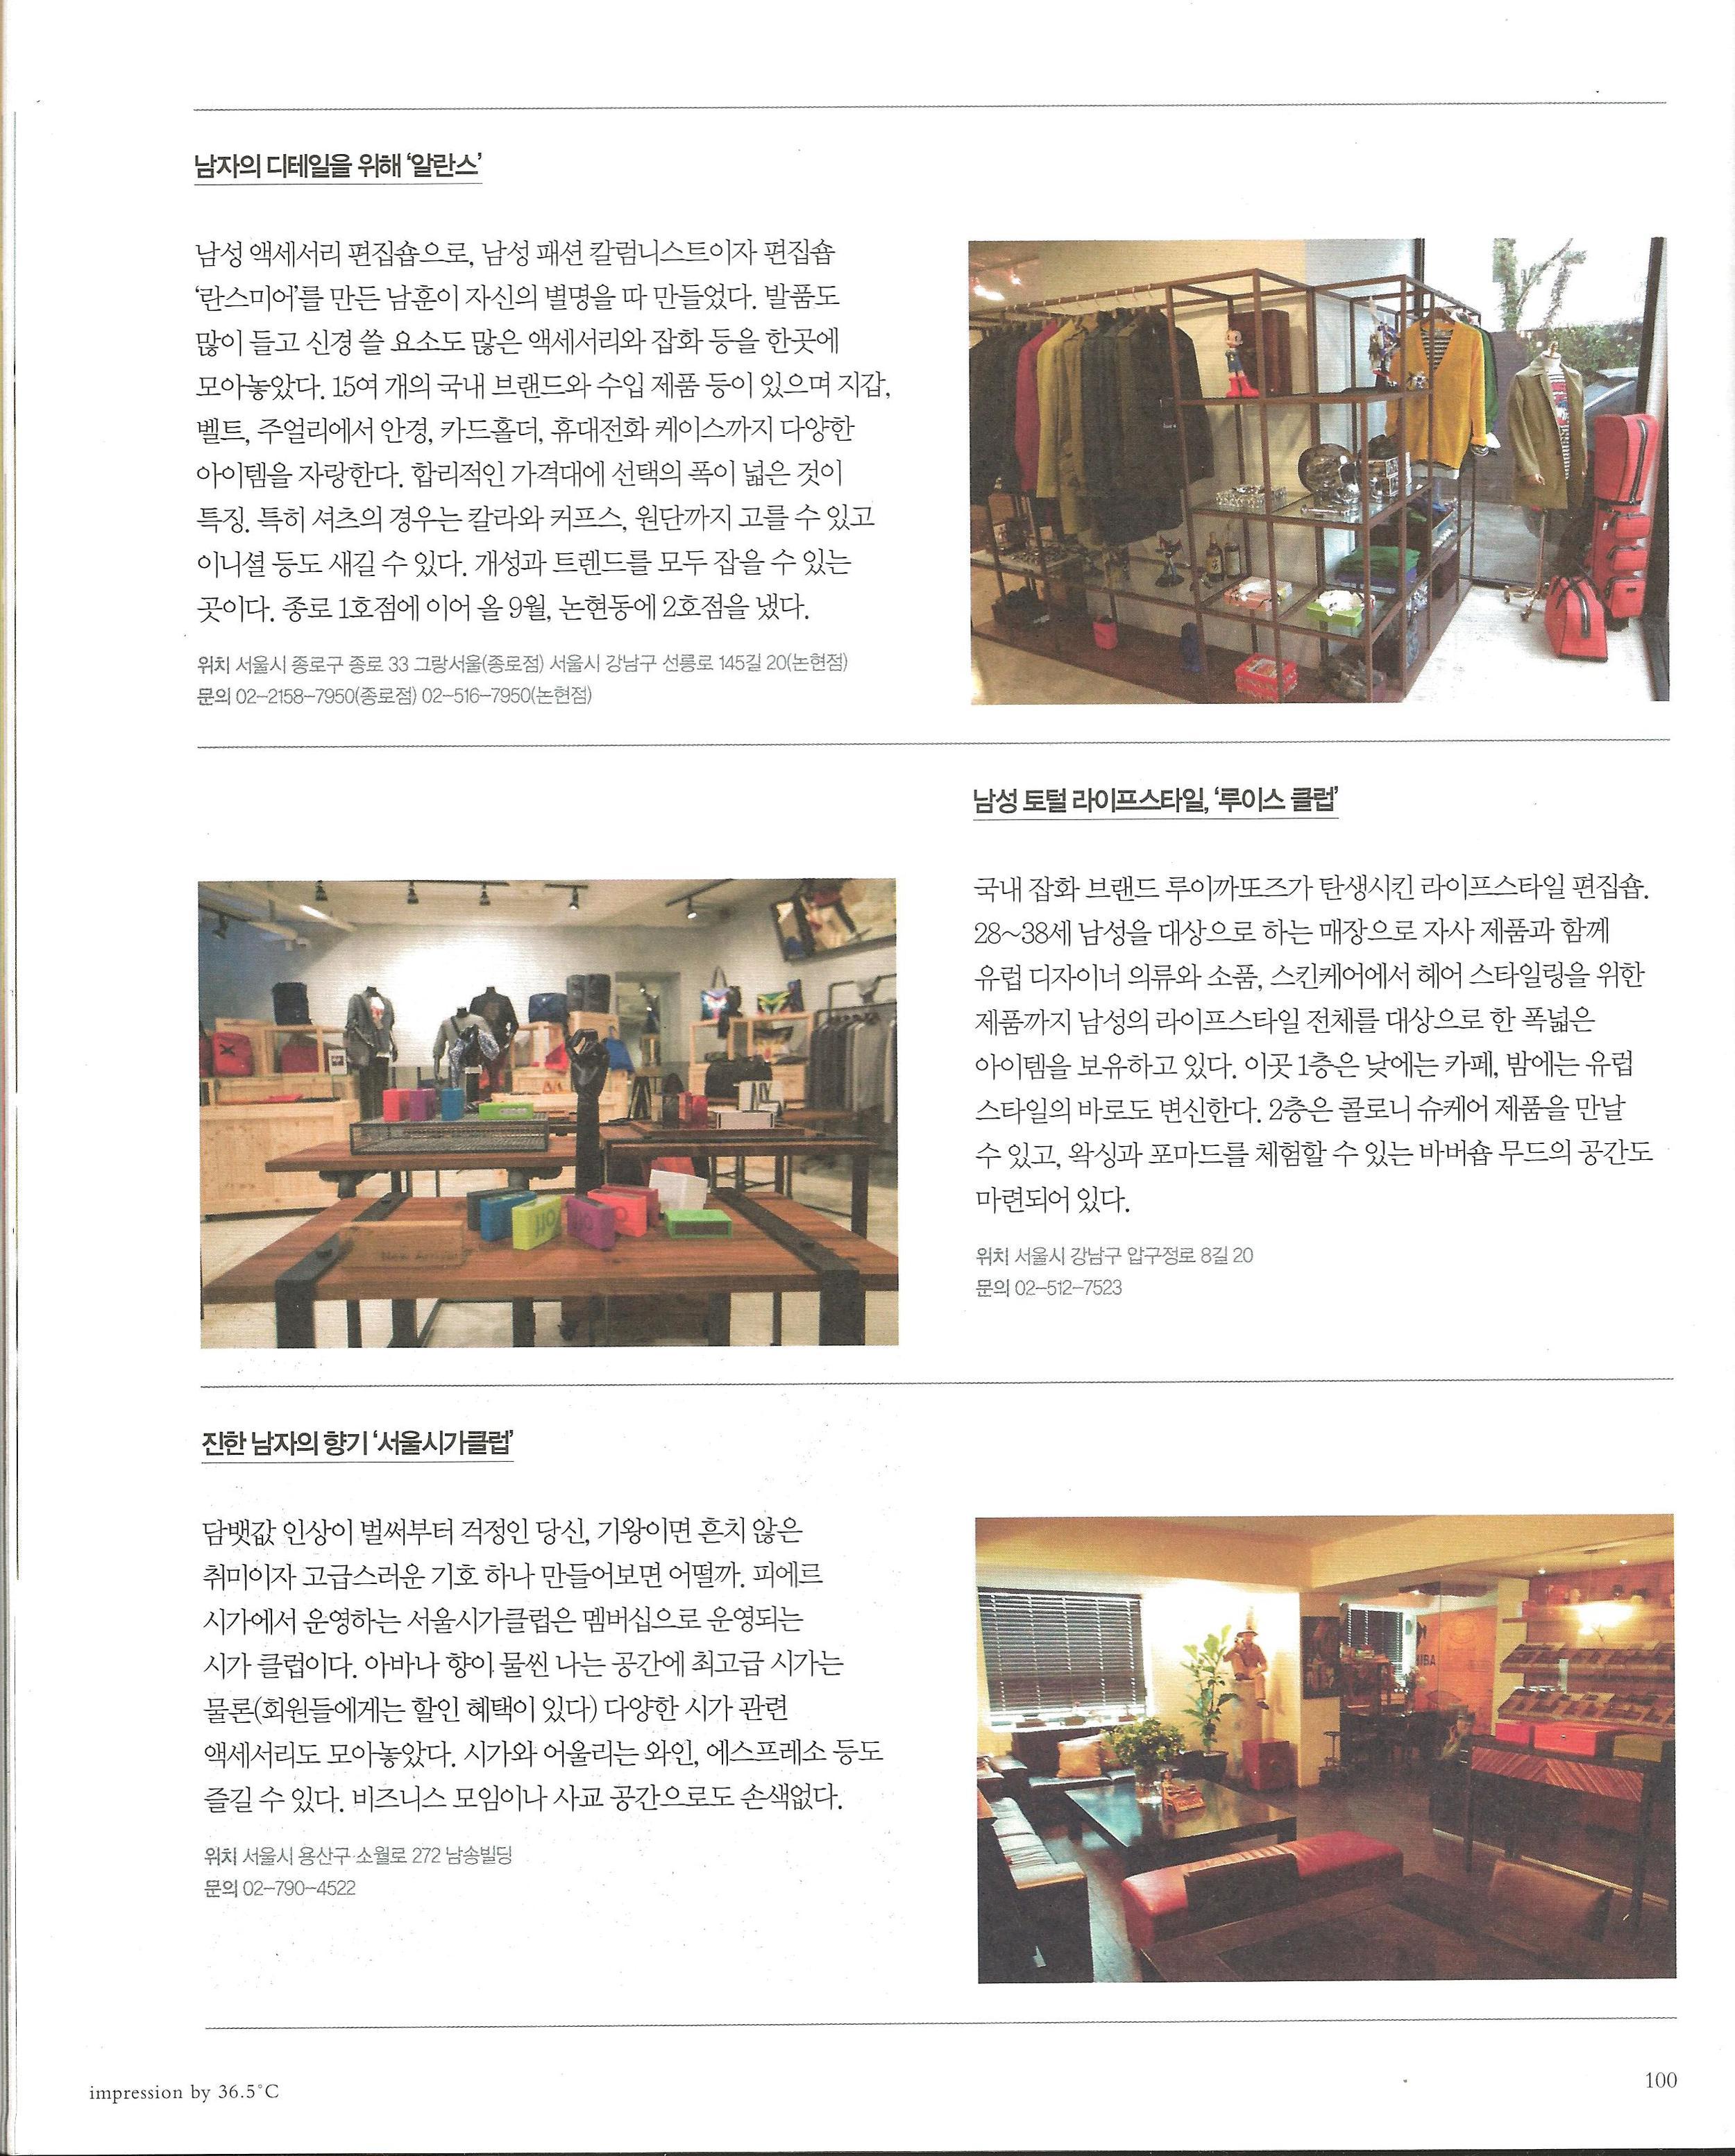 2014-11 Lotte card impression article 1.jpg